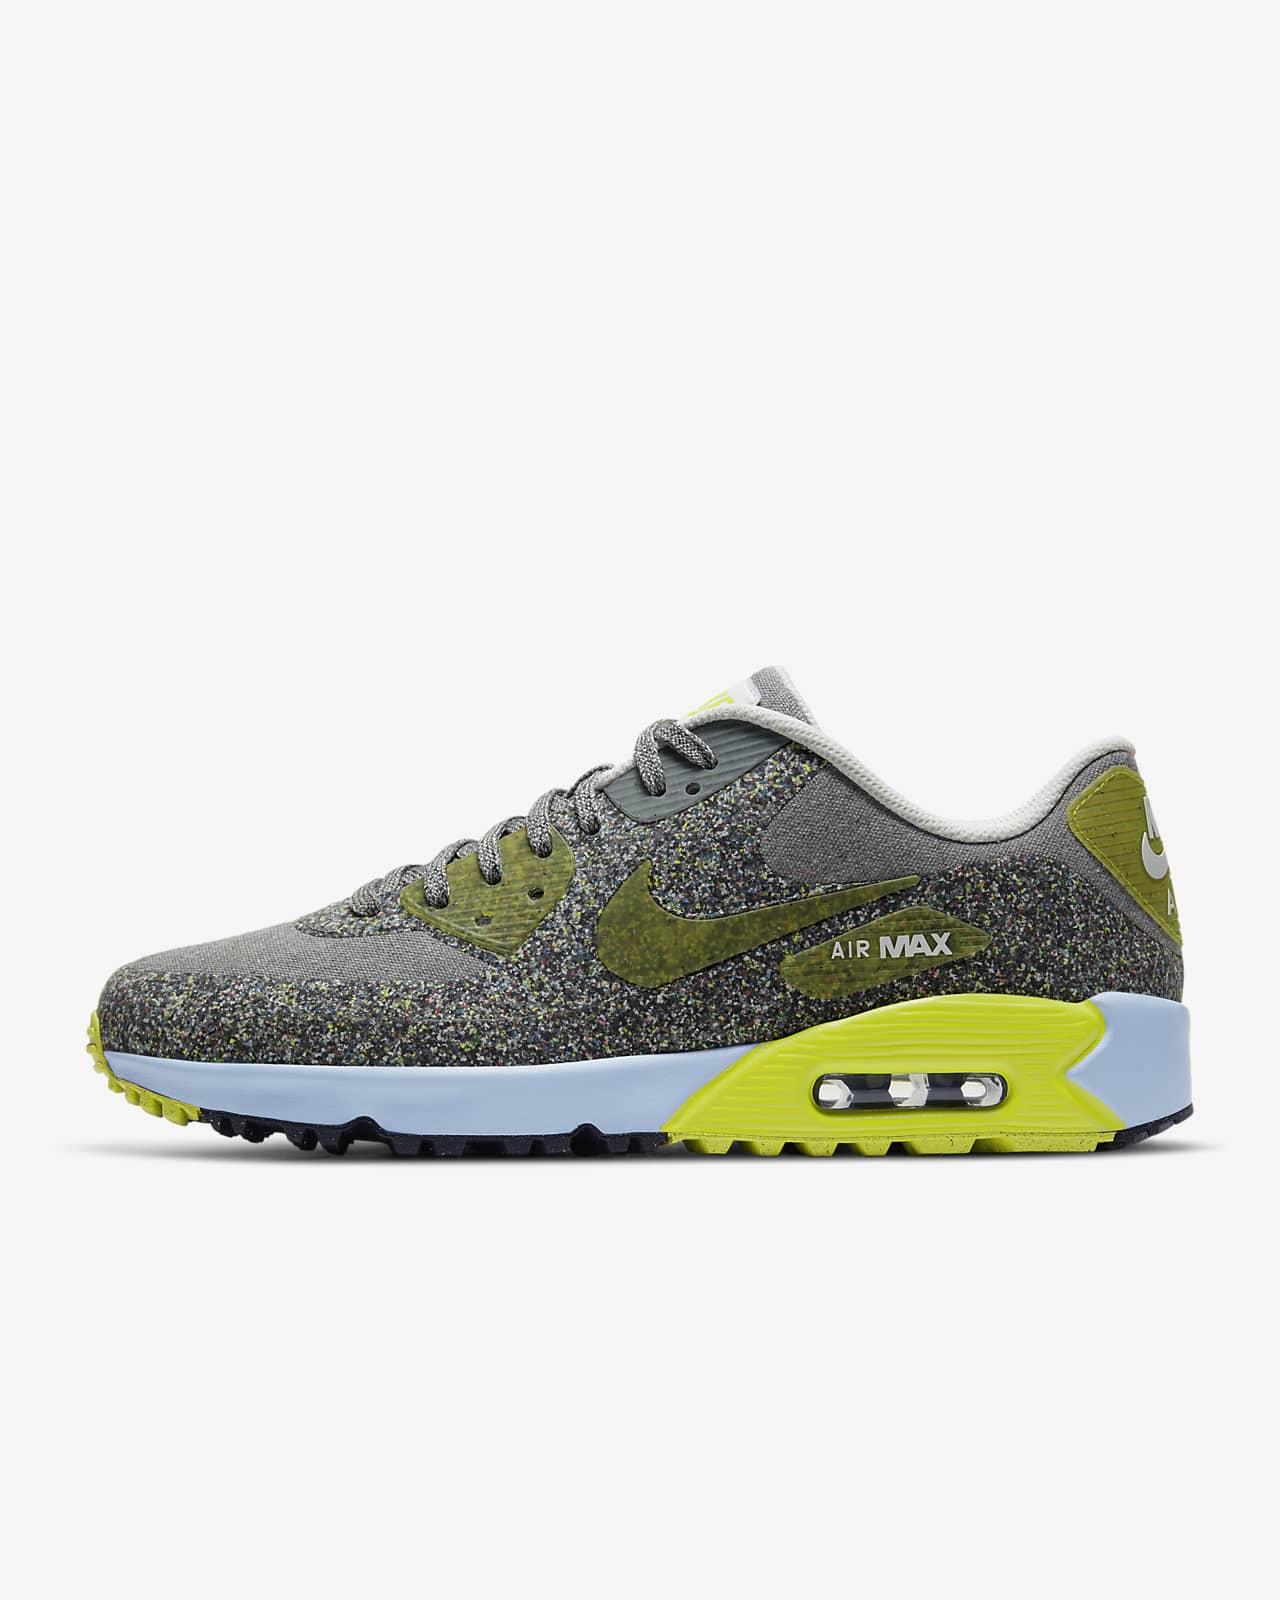 Nike Air Max 90 G NRG 'Dust / Cyber'